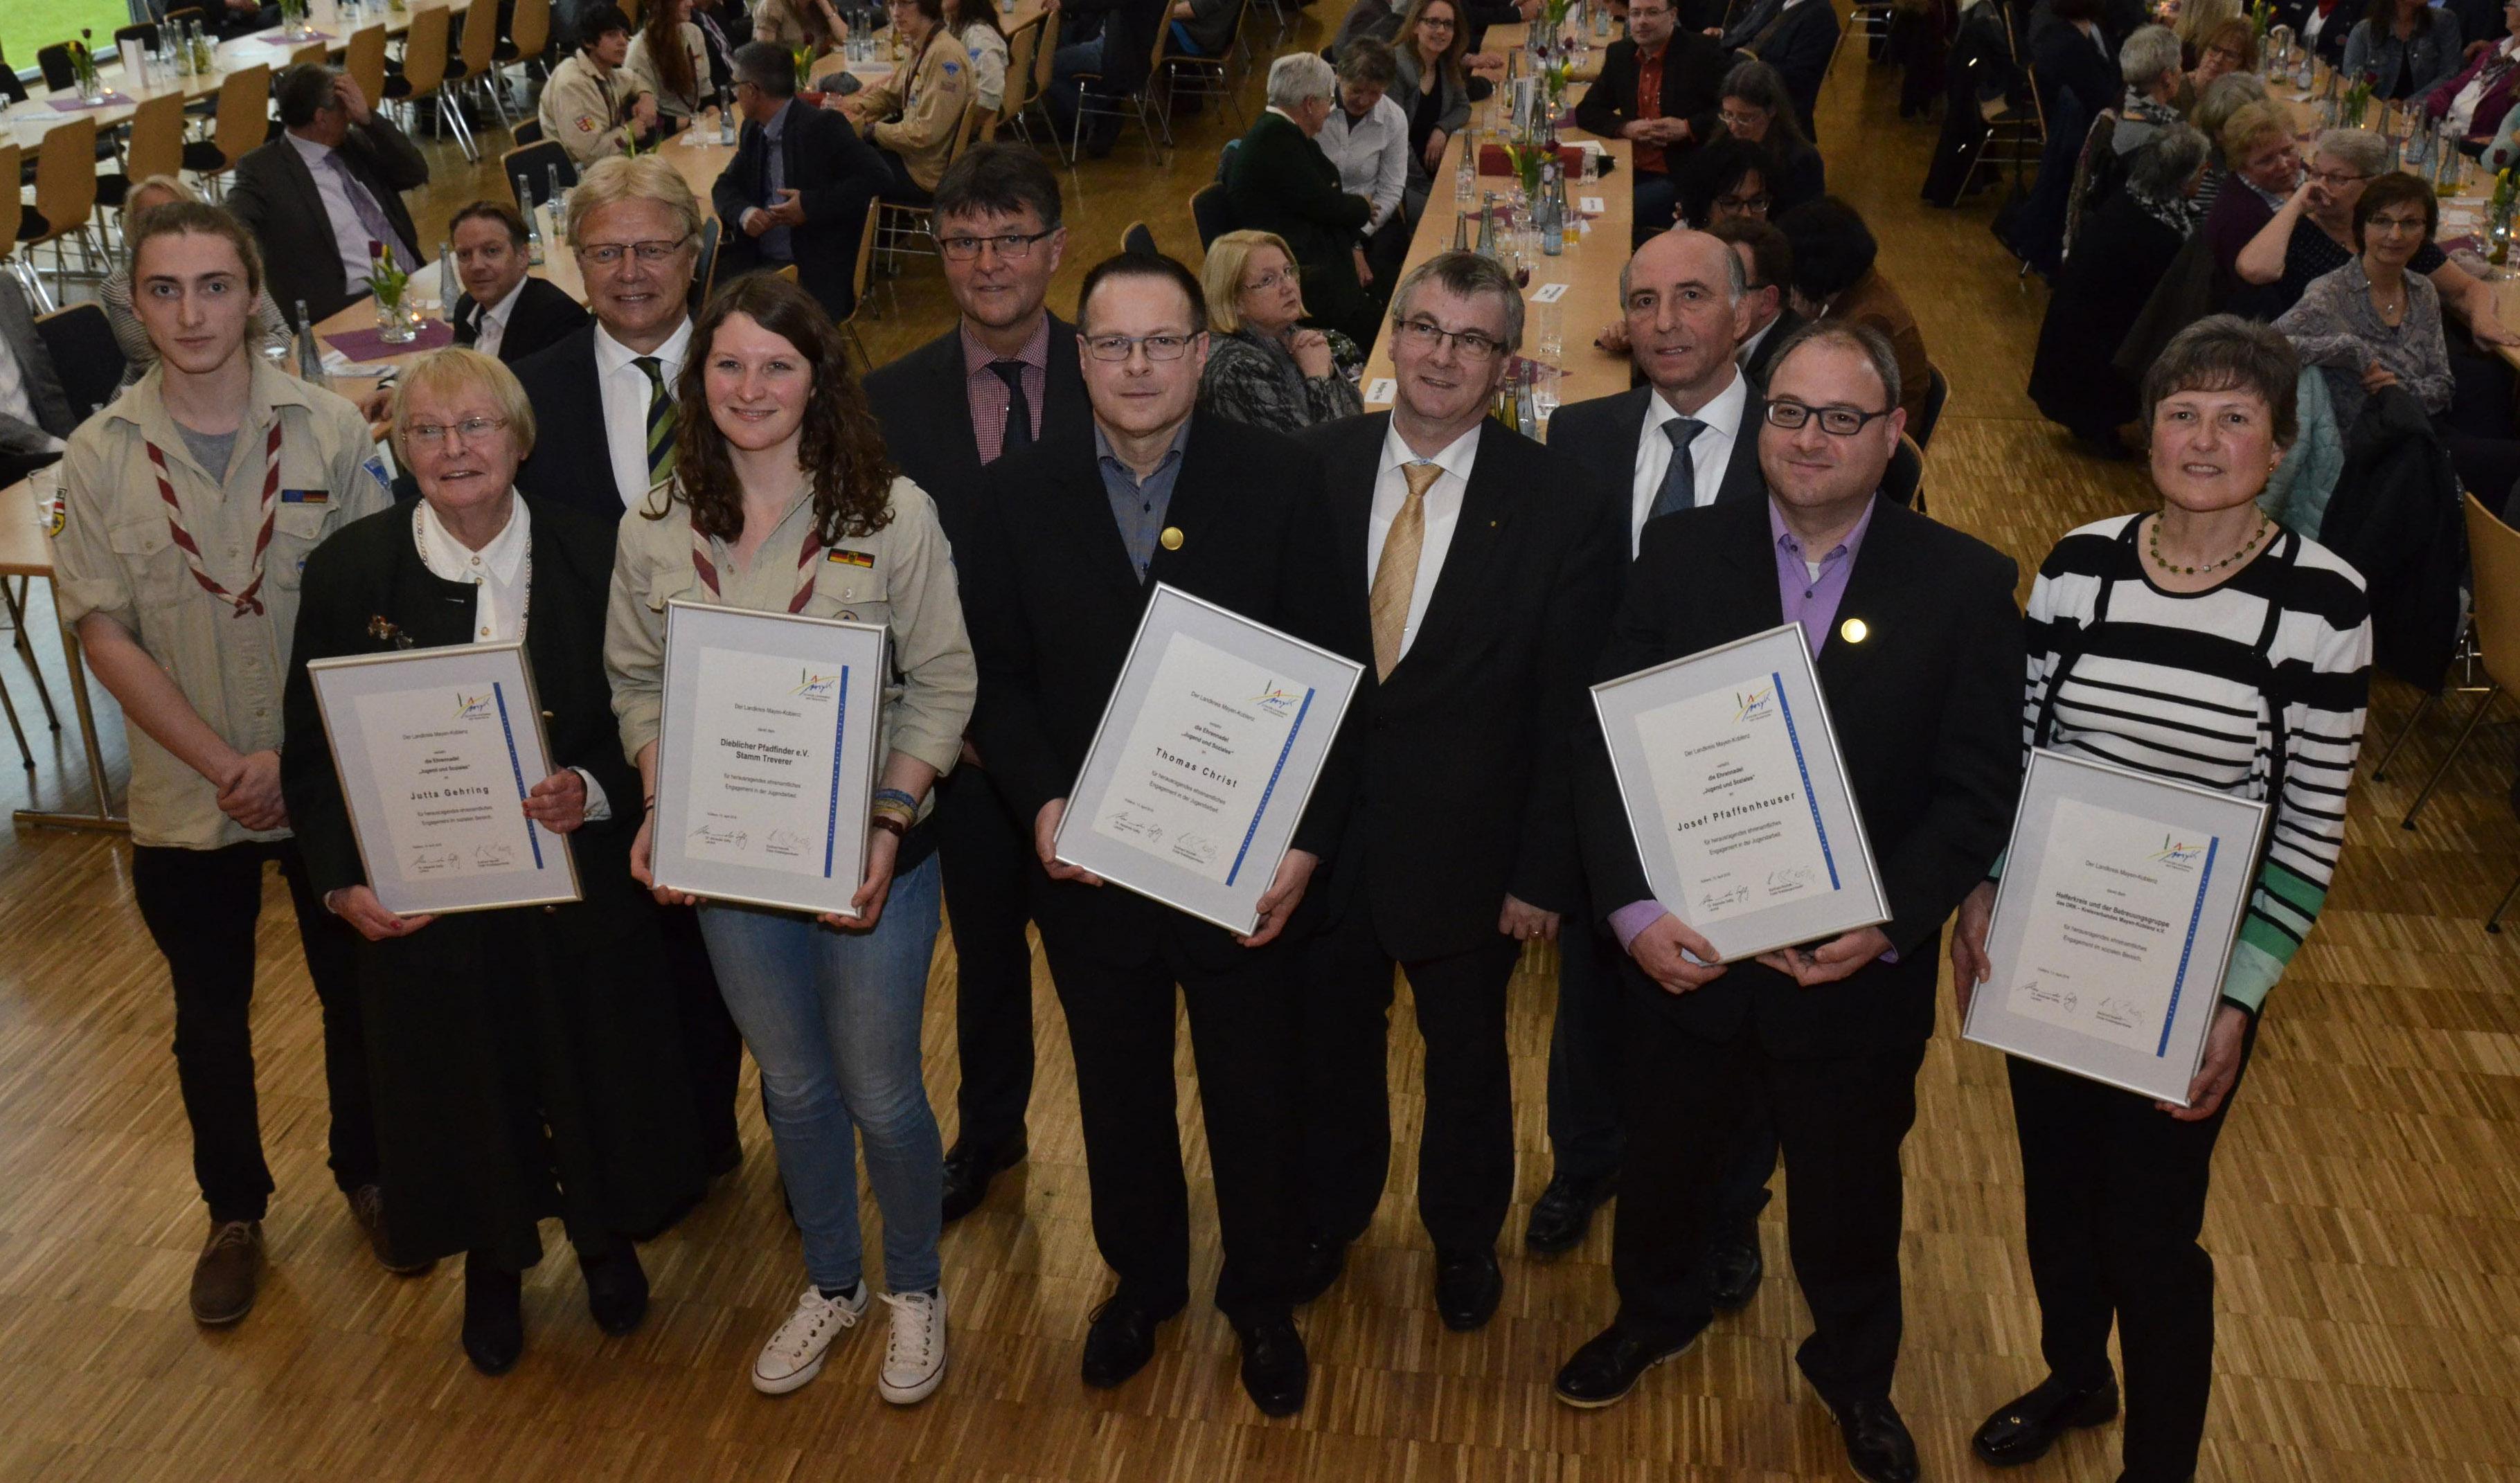 2016.04.13 Jugend und Sozialempfang KV (2)